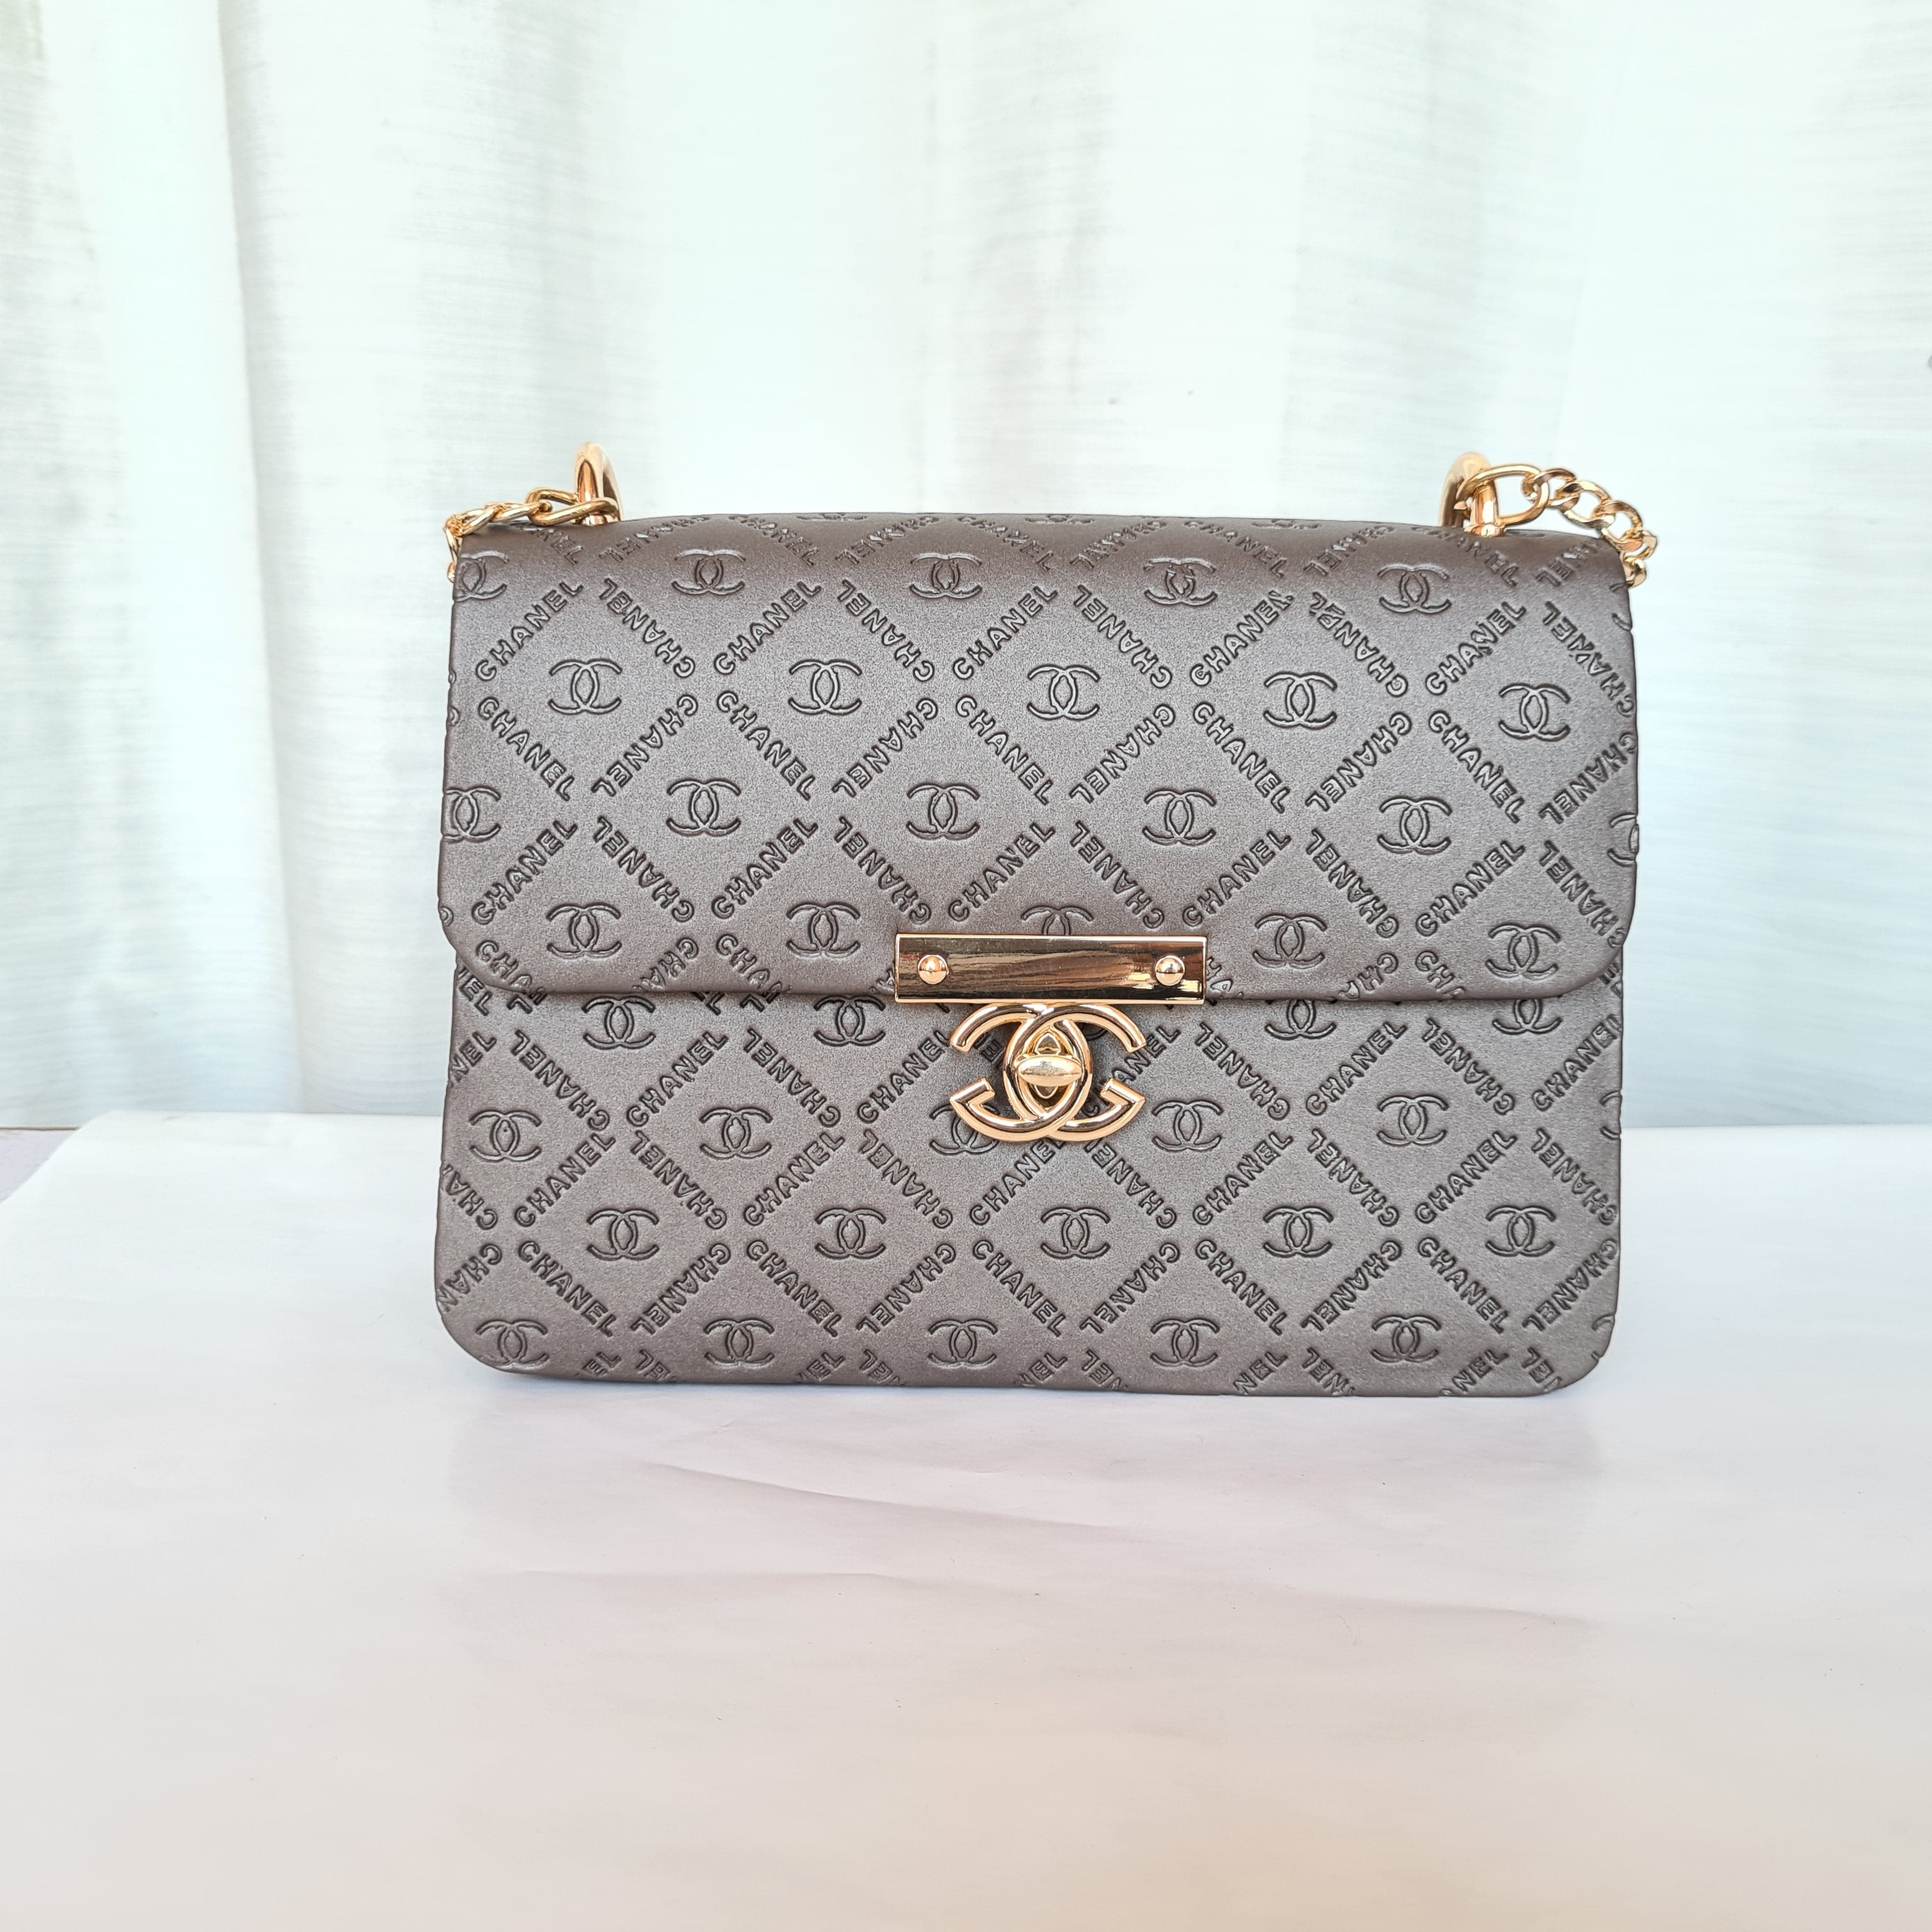 Chanel Ladies Stylish Small Hand Bags QB00181